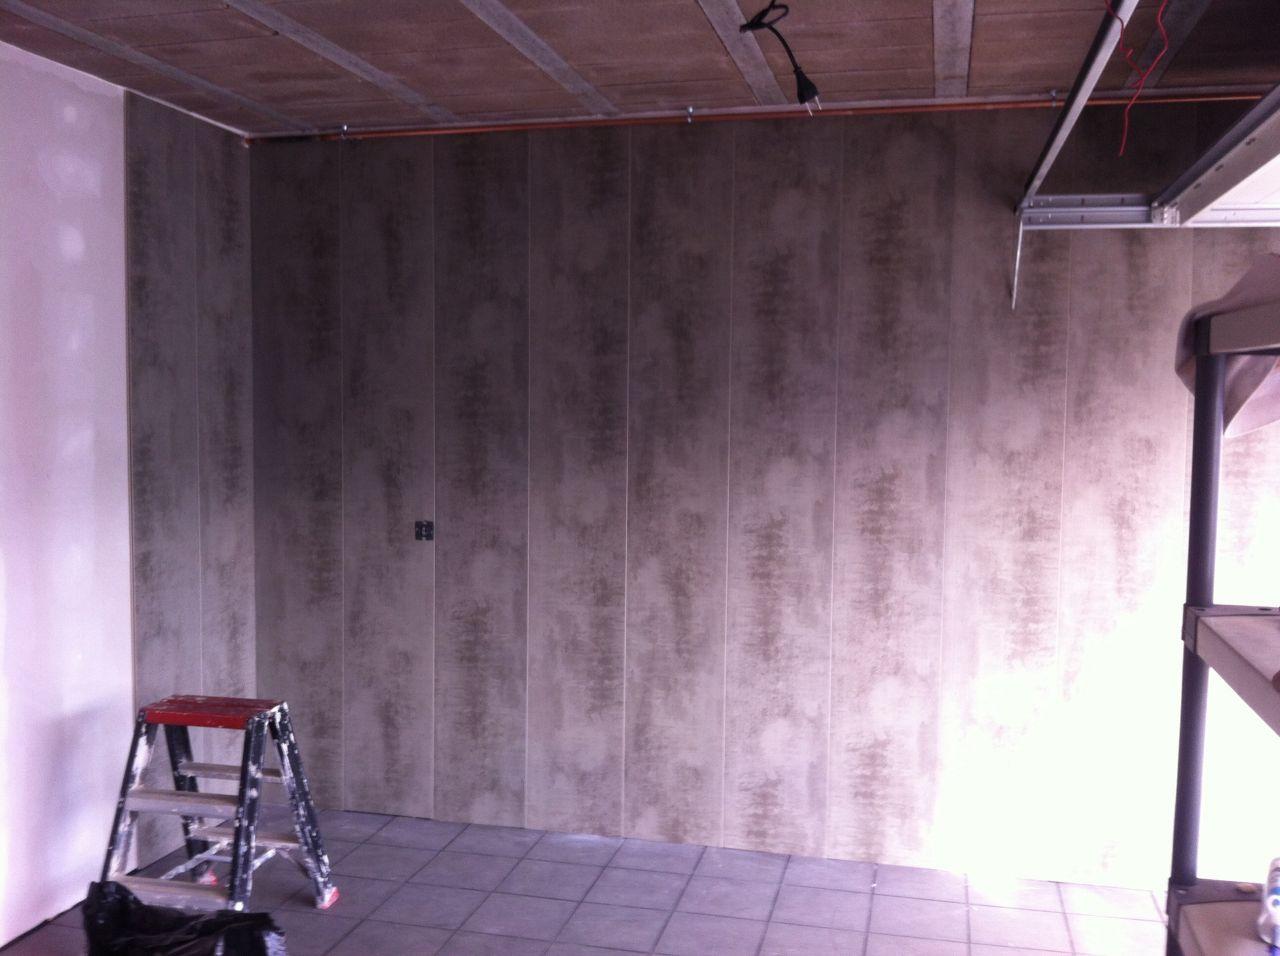 Habillage des murs du garage ottange moselle for Habillage mur interieur pvc